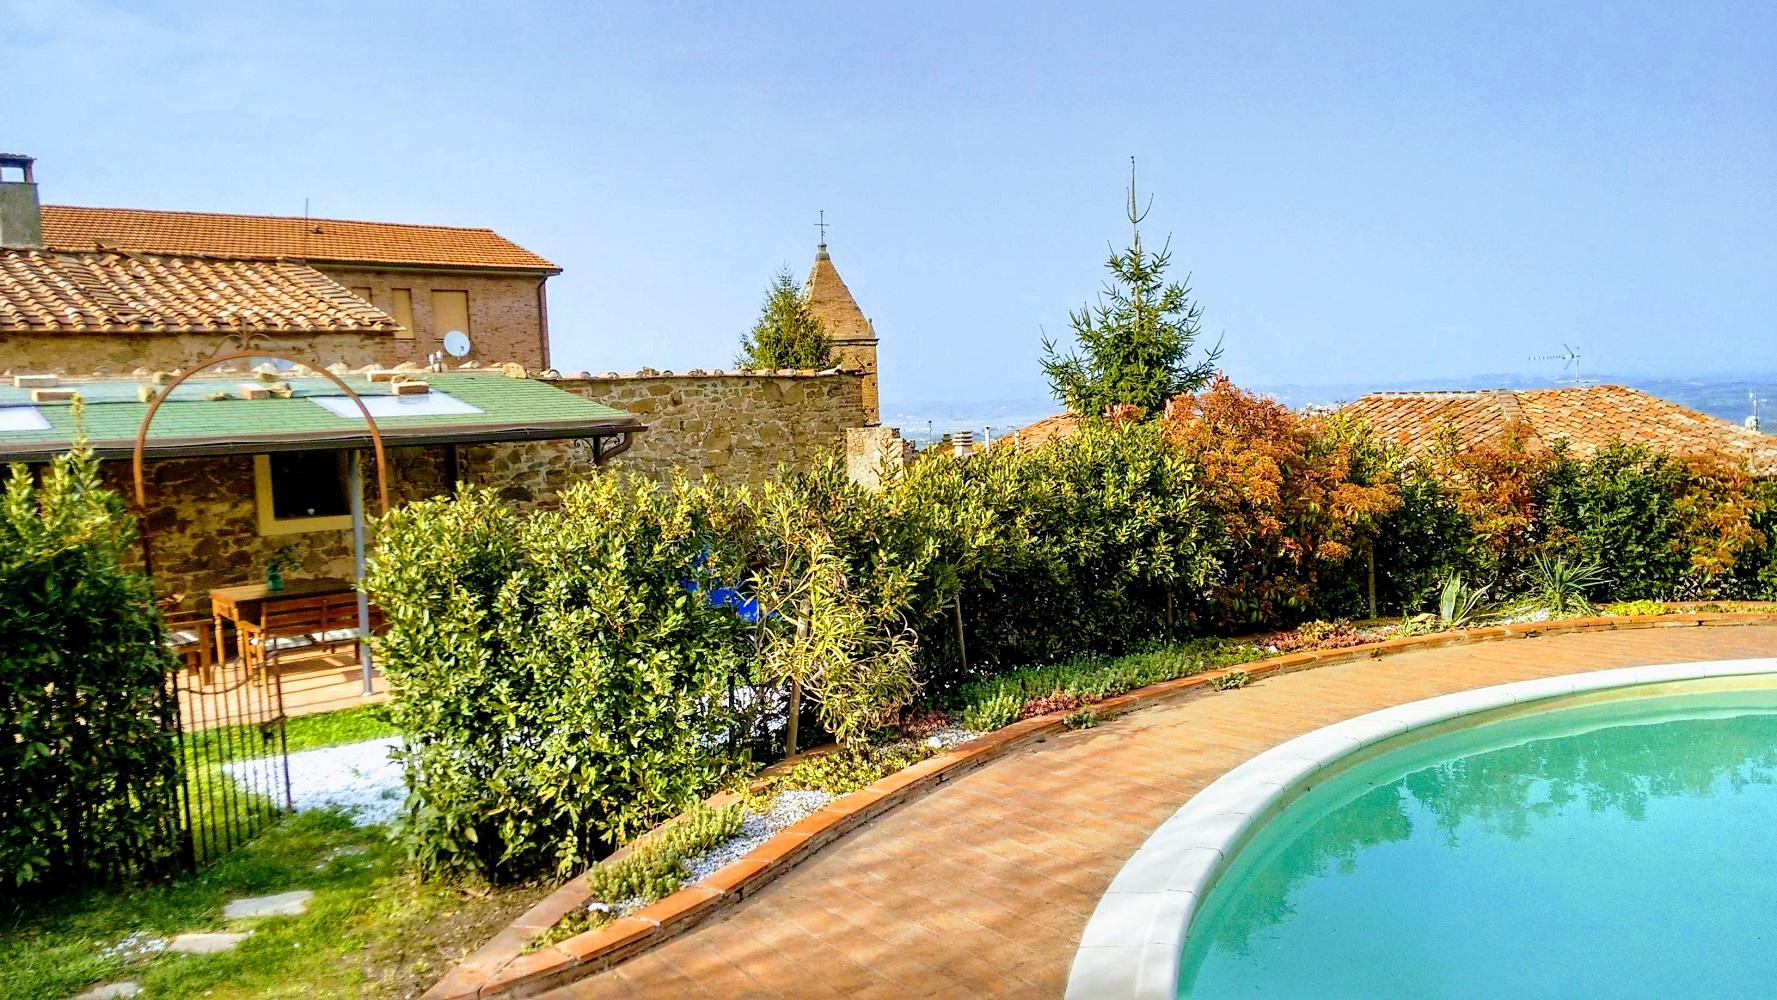 Toskana - Pisa, exklusives Ferienhaus mit Pool, yoga, internet